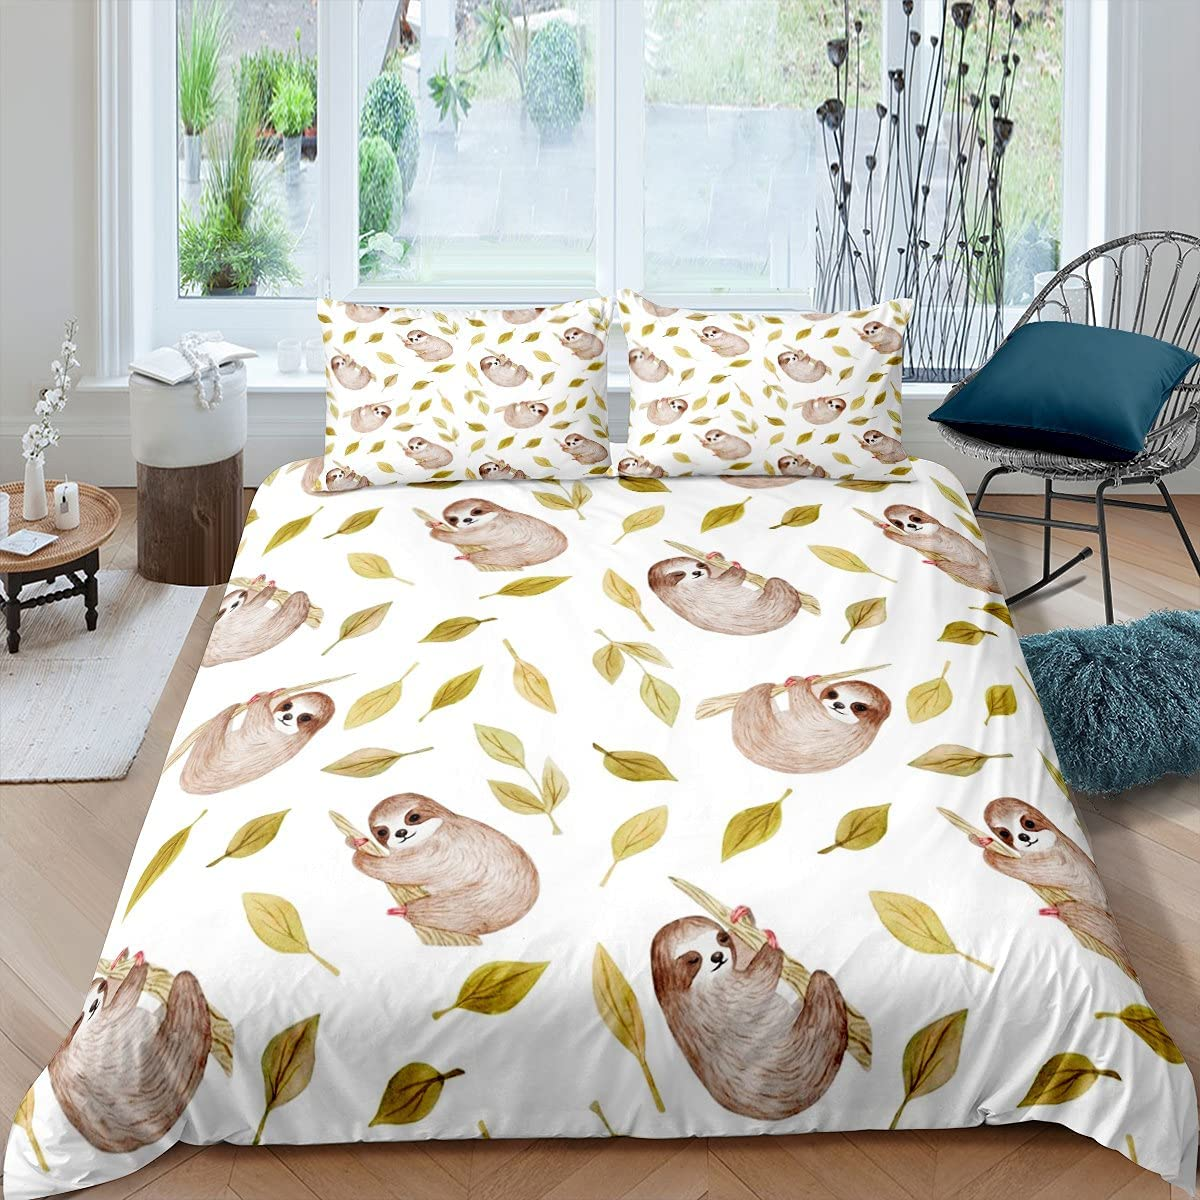 Erosebridal Sloth Comforter Cover Max 81% OFF Cute Animal Classic Duve Cartoon Theme